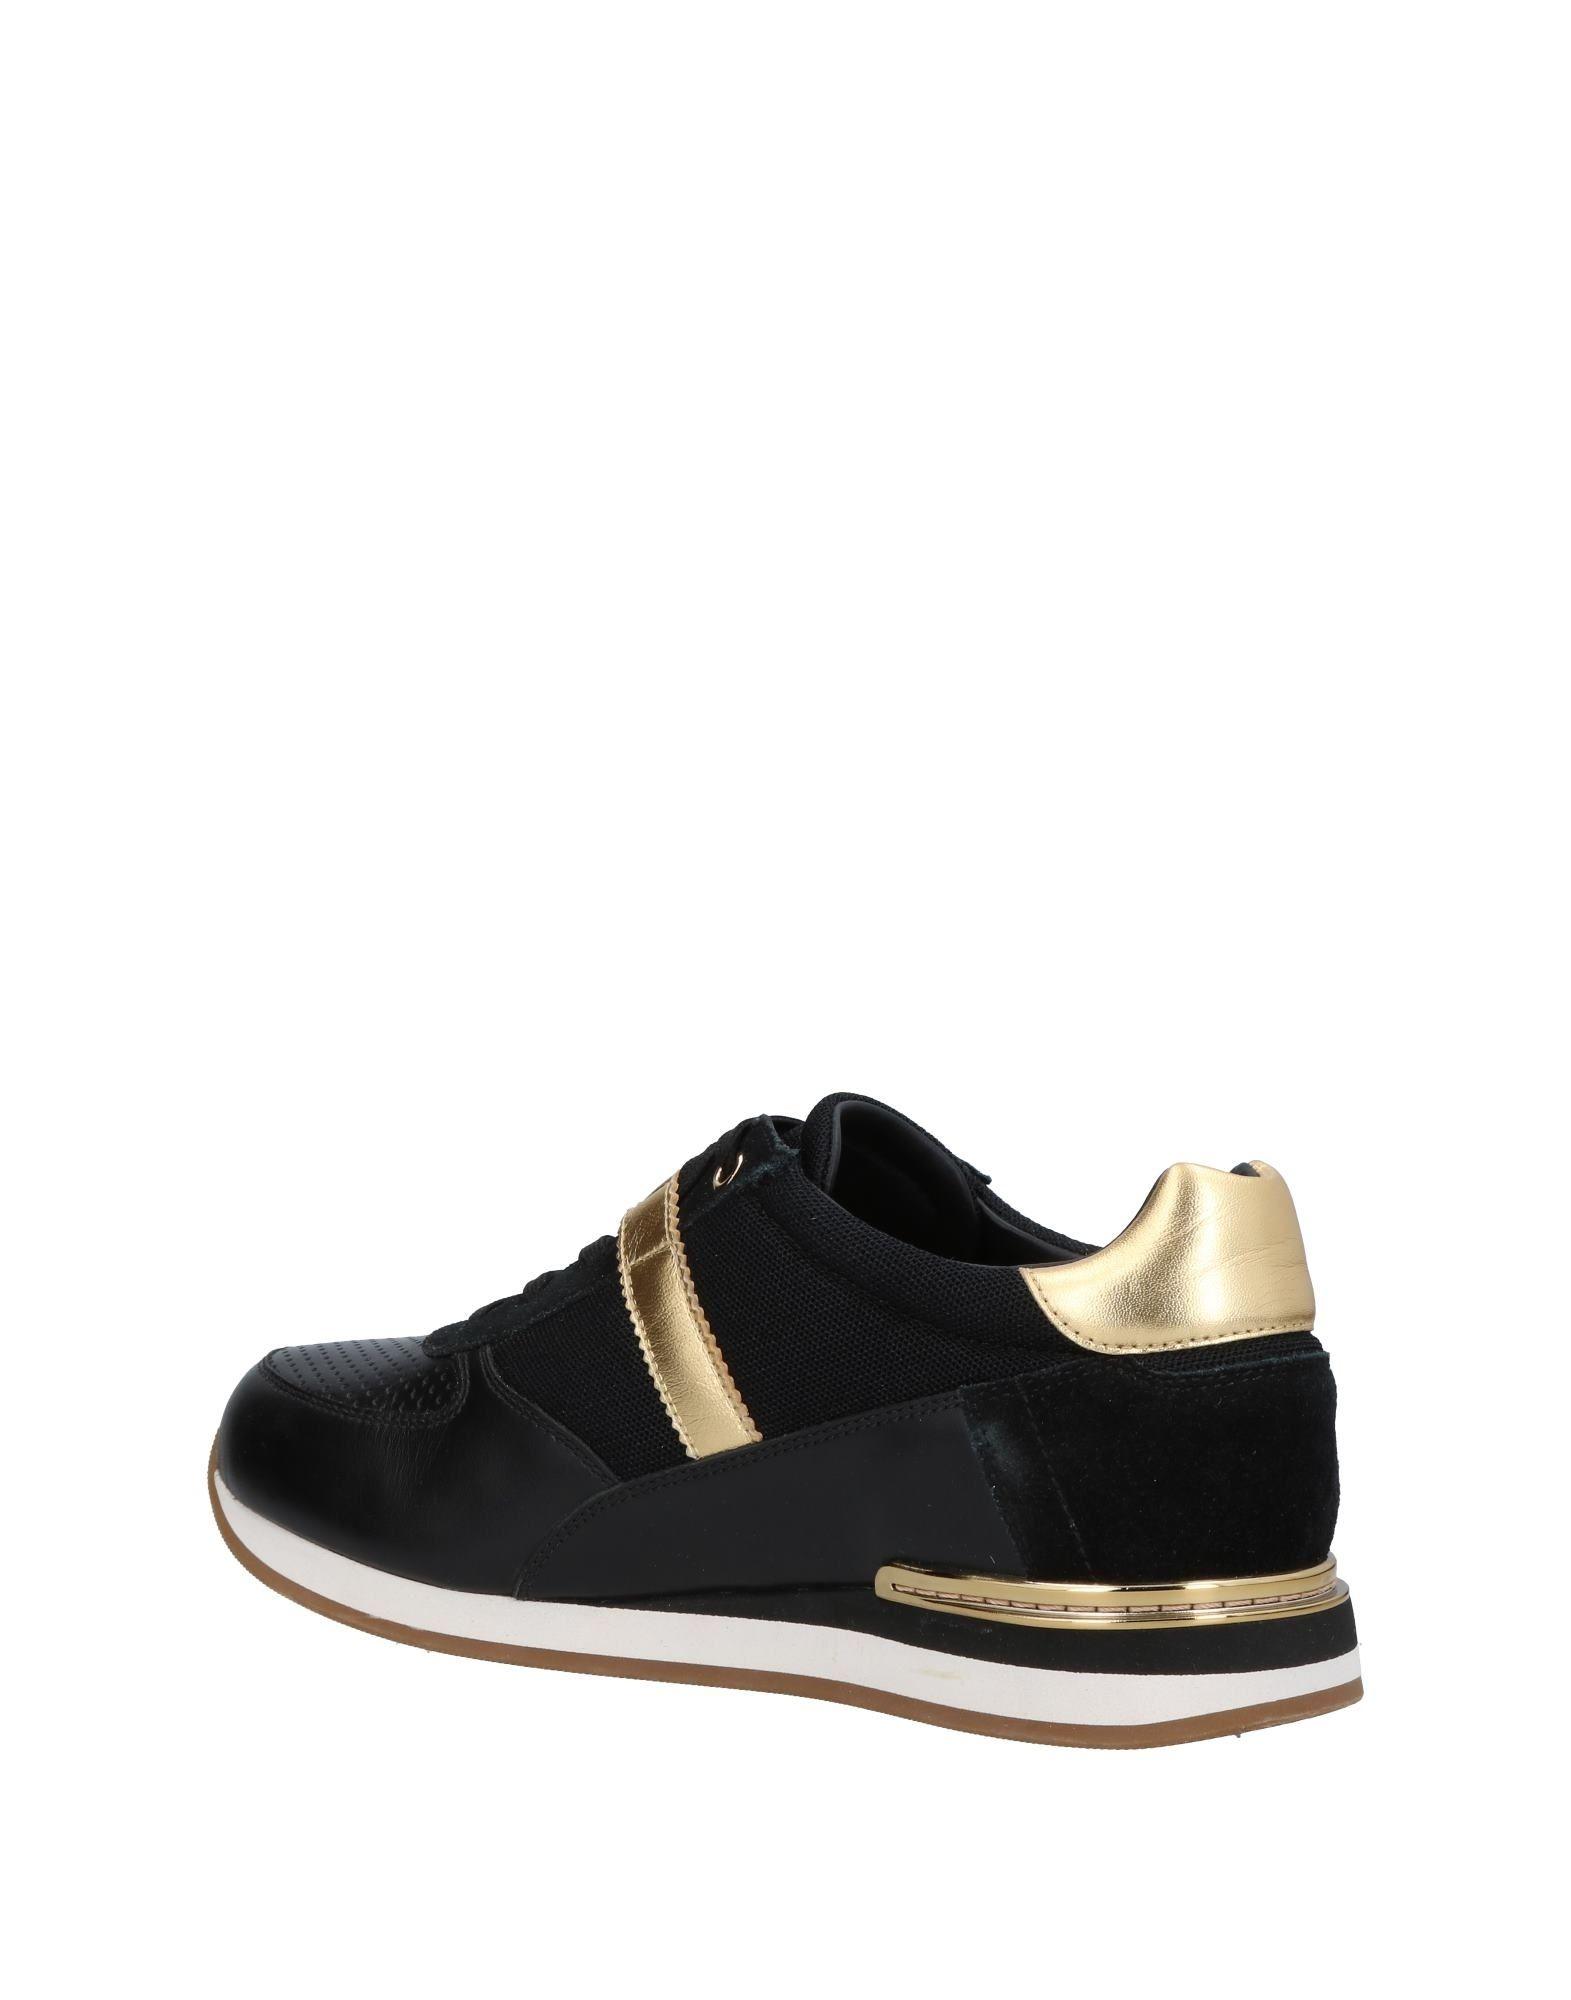 Dolce & Gabbana Sneakers Herren  11408016XH Gute Qualität beliebte Schuhe